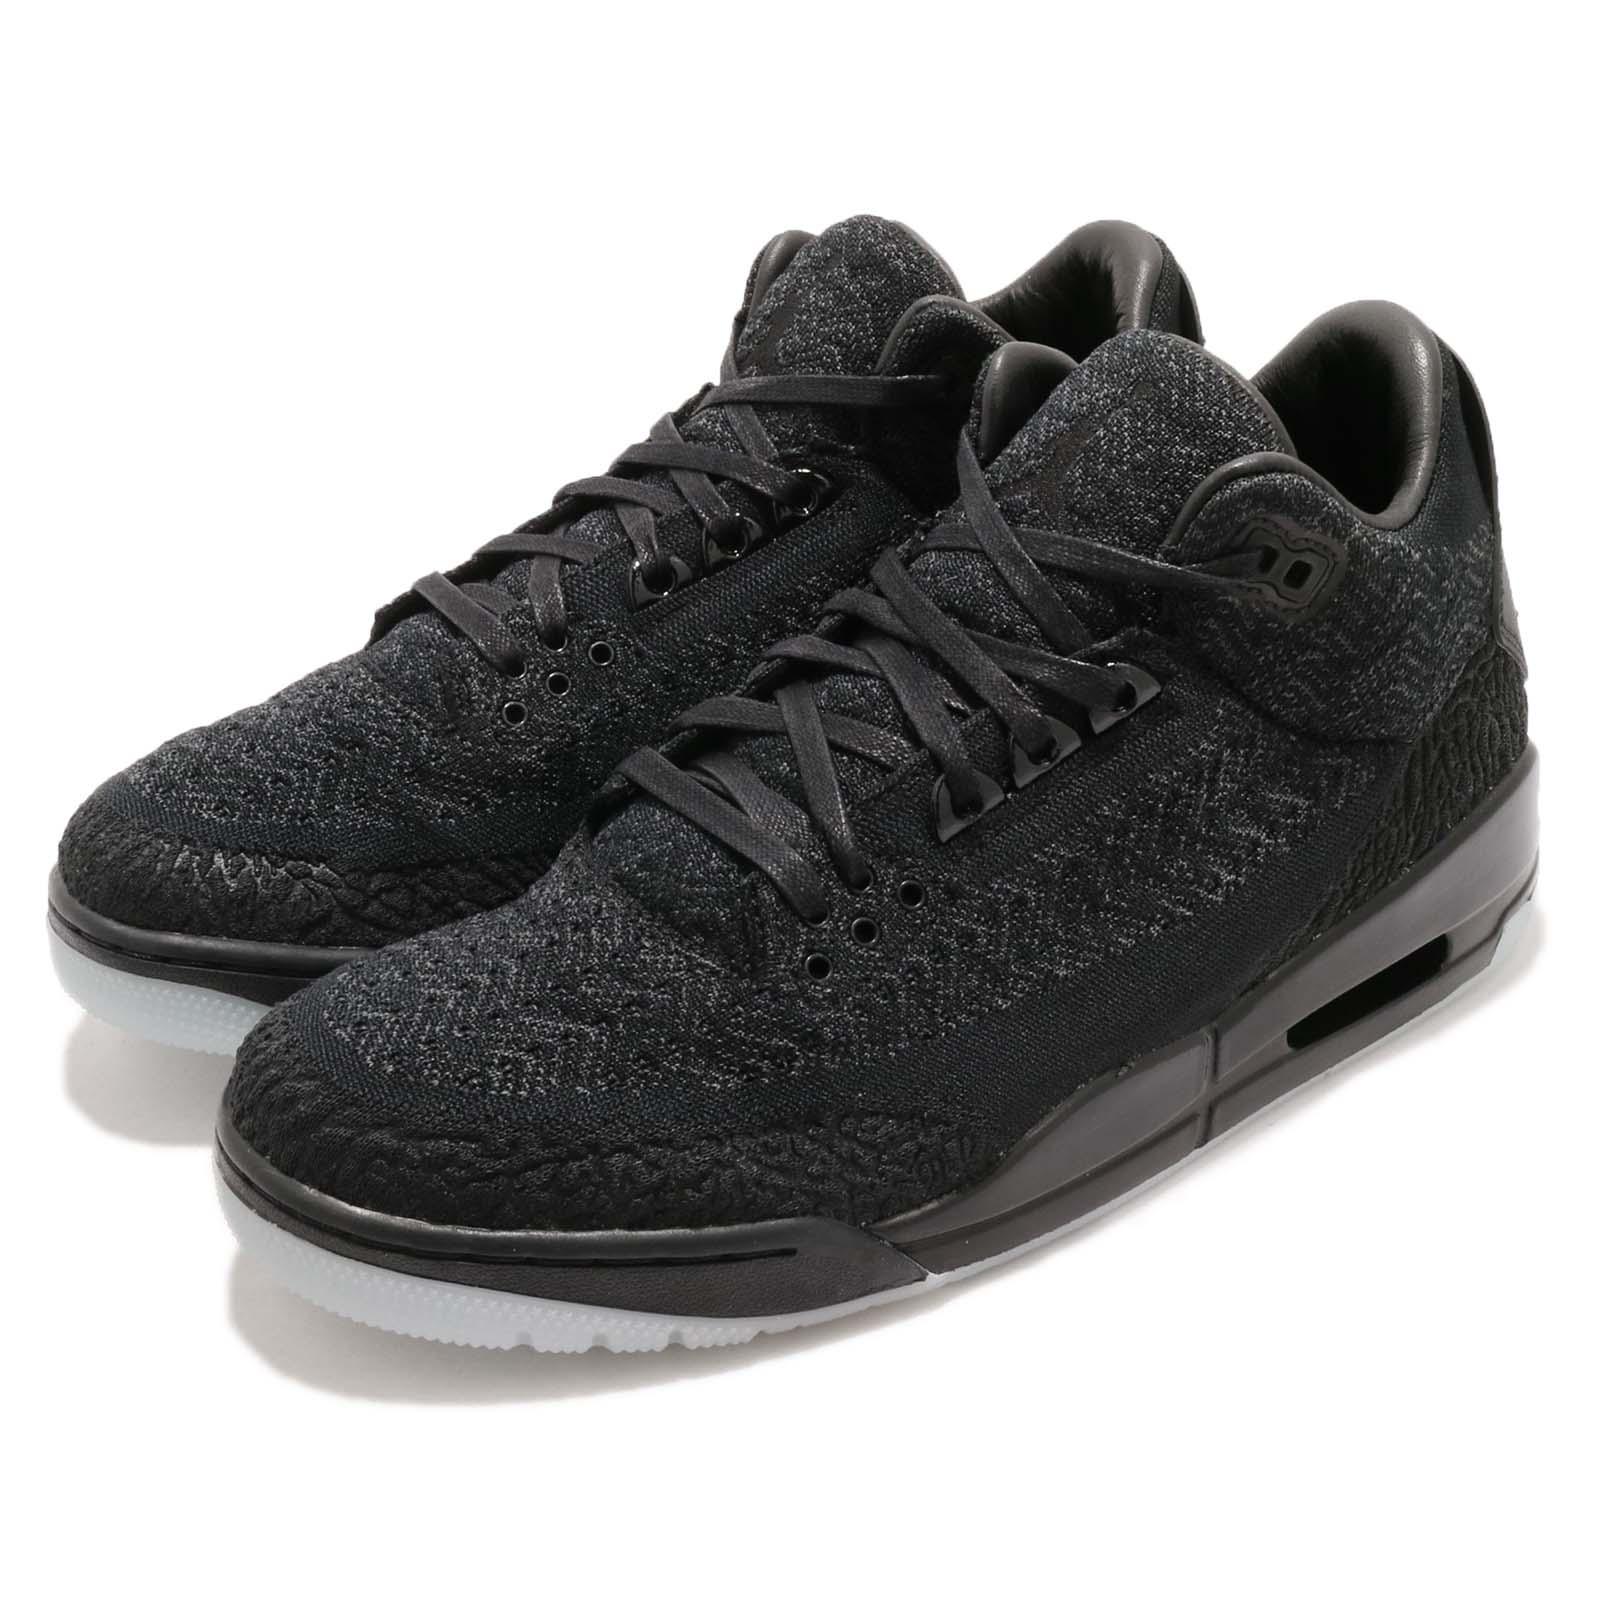 Nike 籃球鞋 Jordan 3代 男鞋 AQ1005-001